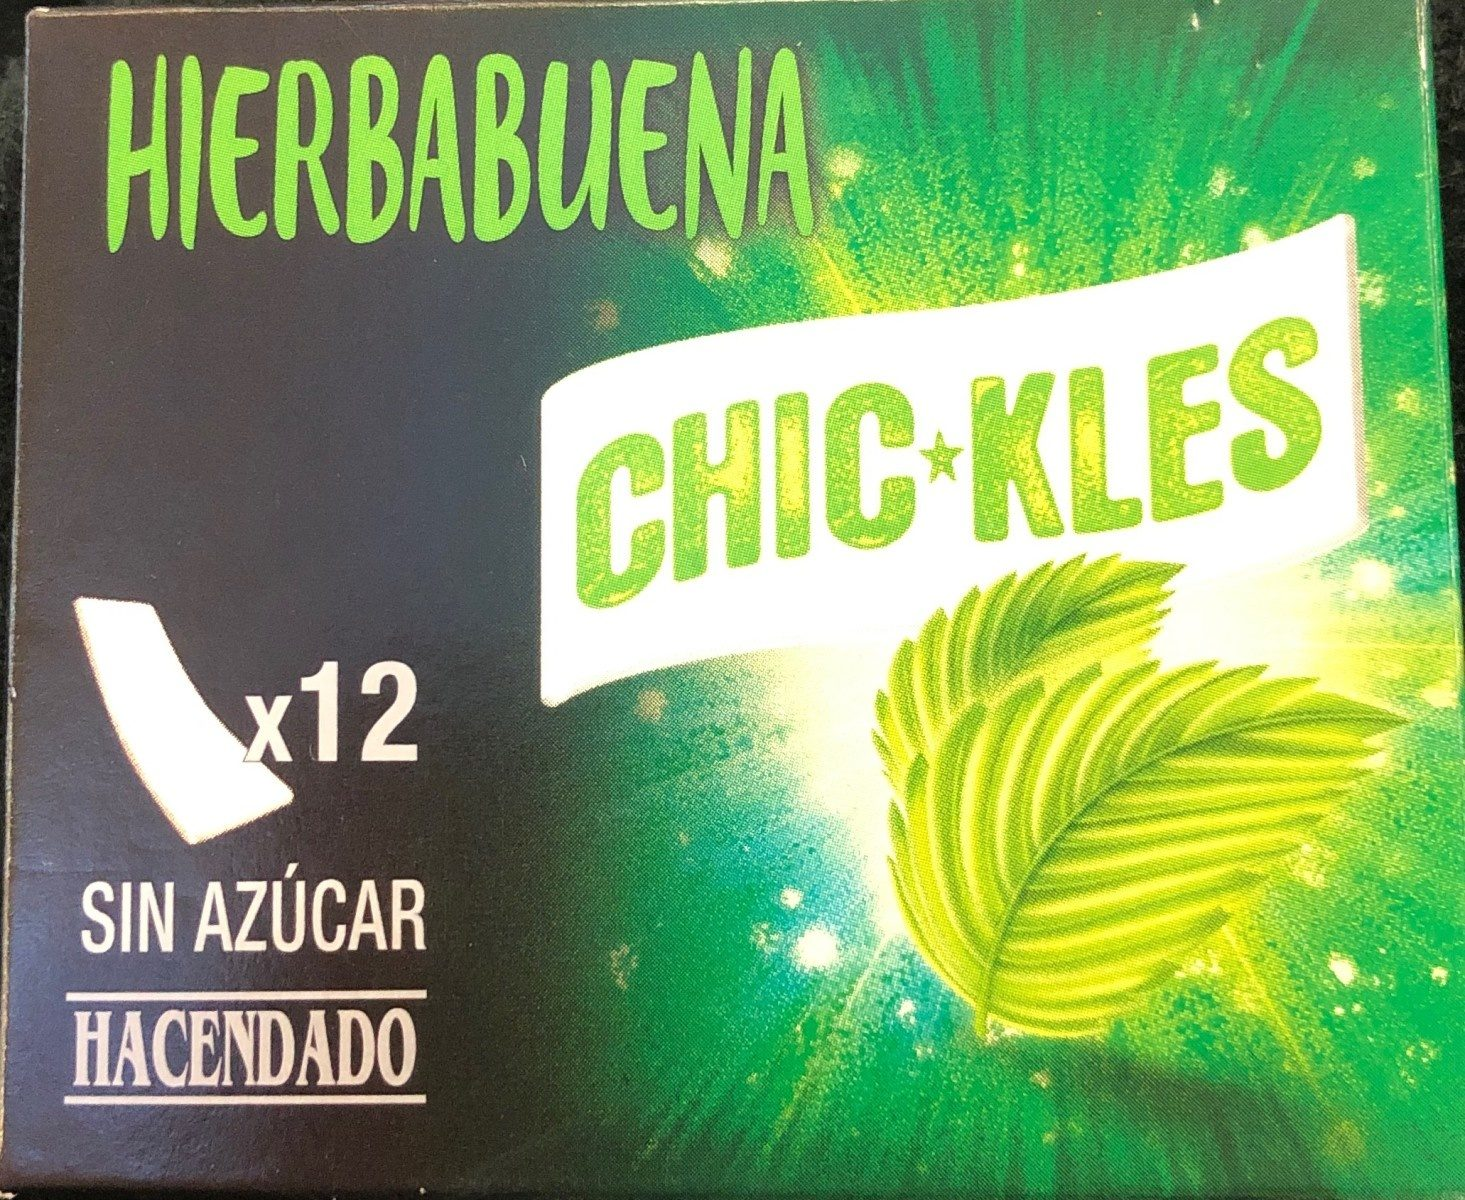 Chic*kles hierbabuena - Produkt - es